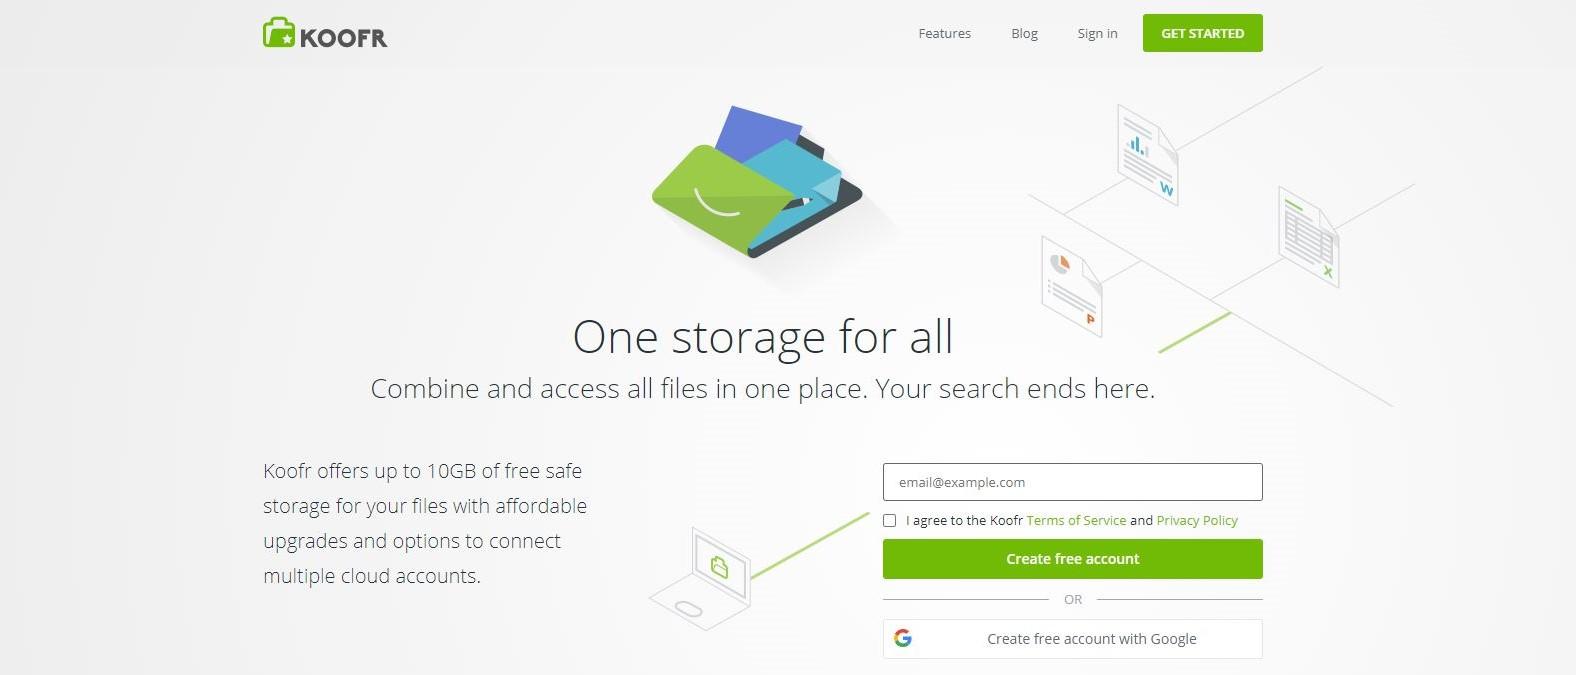 Koofr Review | TechRadar